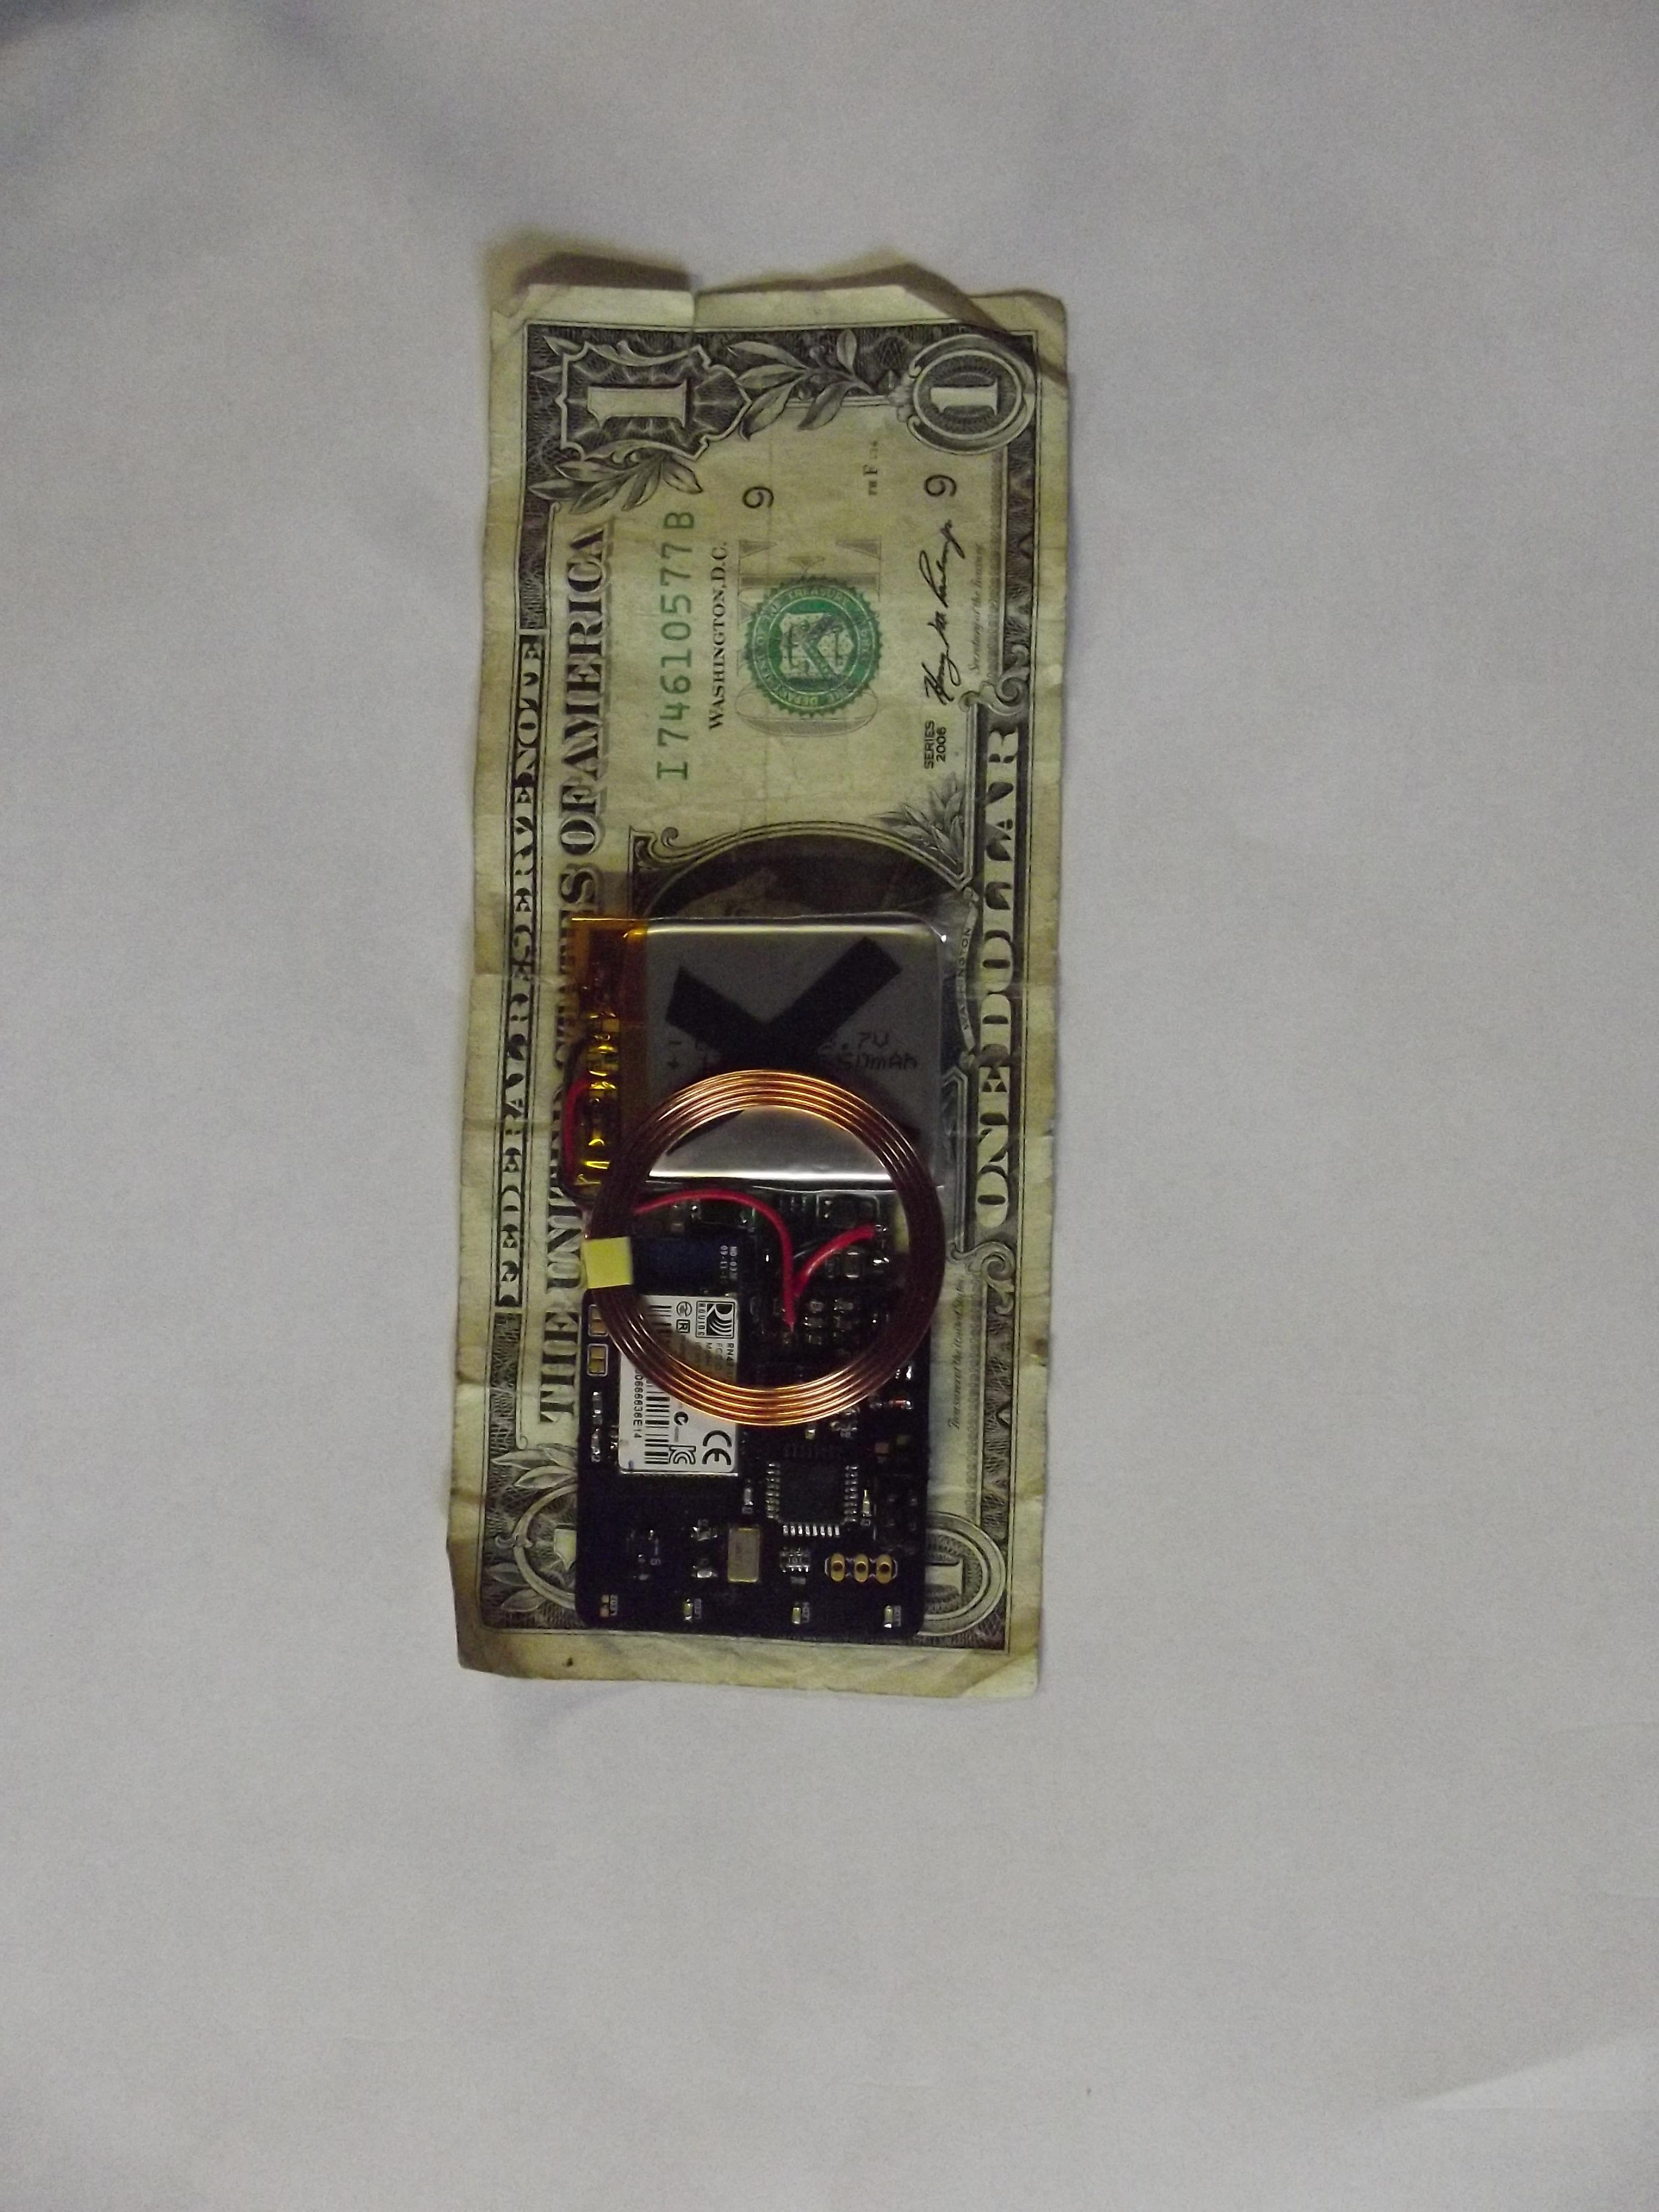 Biohacking Grinder Update Tim Cannon Implants Circadia 10 H Circuit Boards Like Magic Appears Gf57jyh Imgur